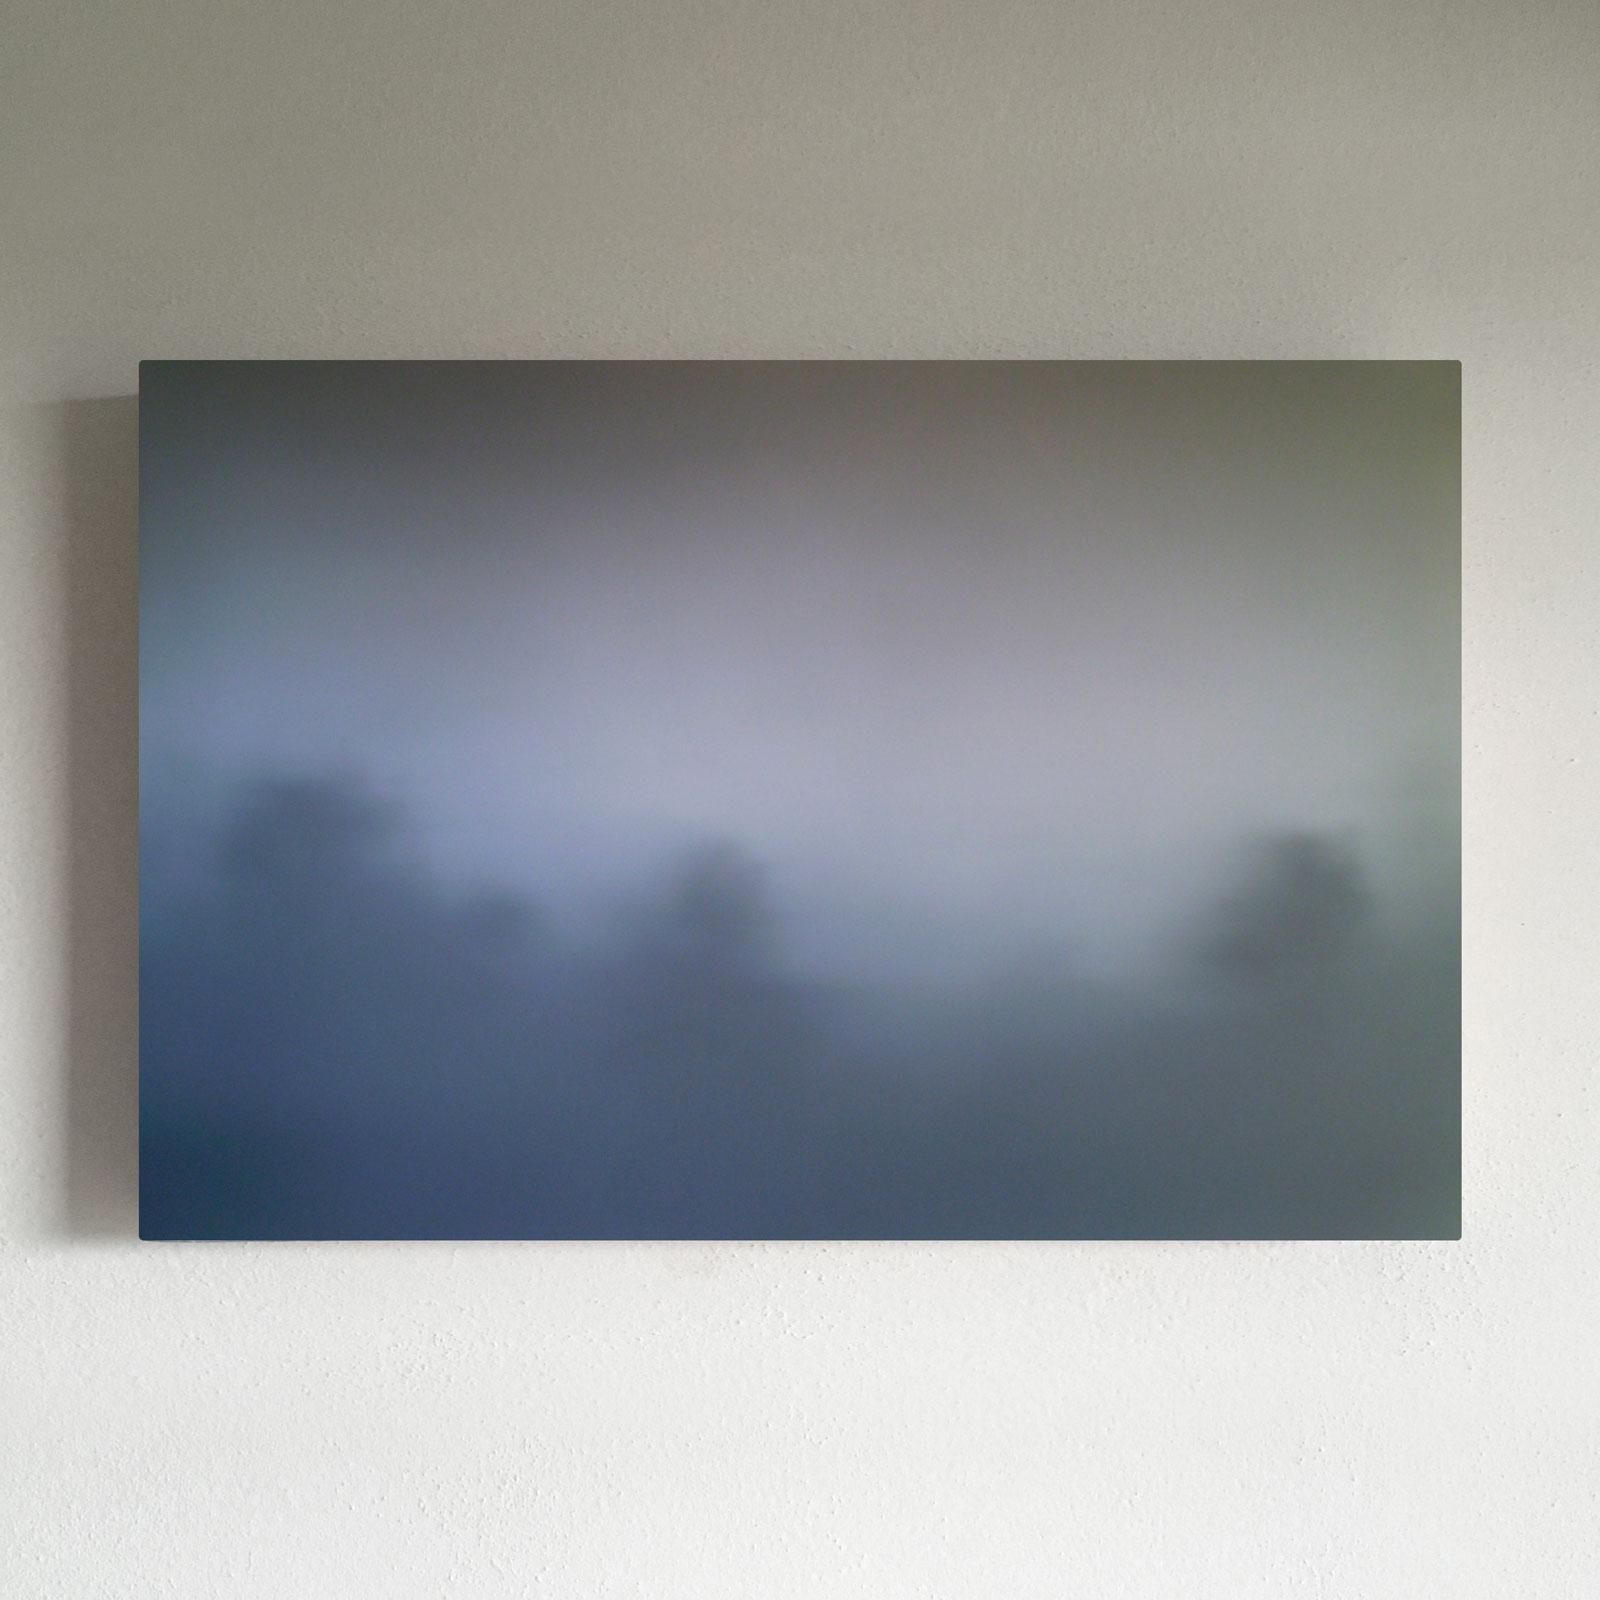 T#23-2009, oil on canvas, 80x120cm, priv. coll.